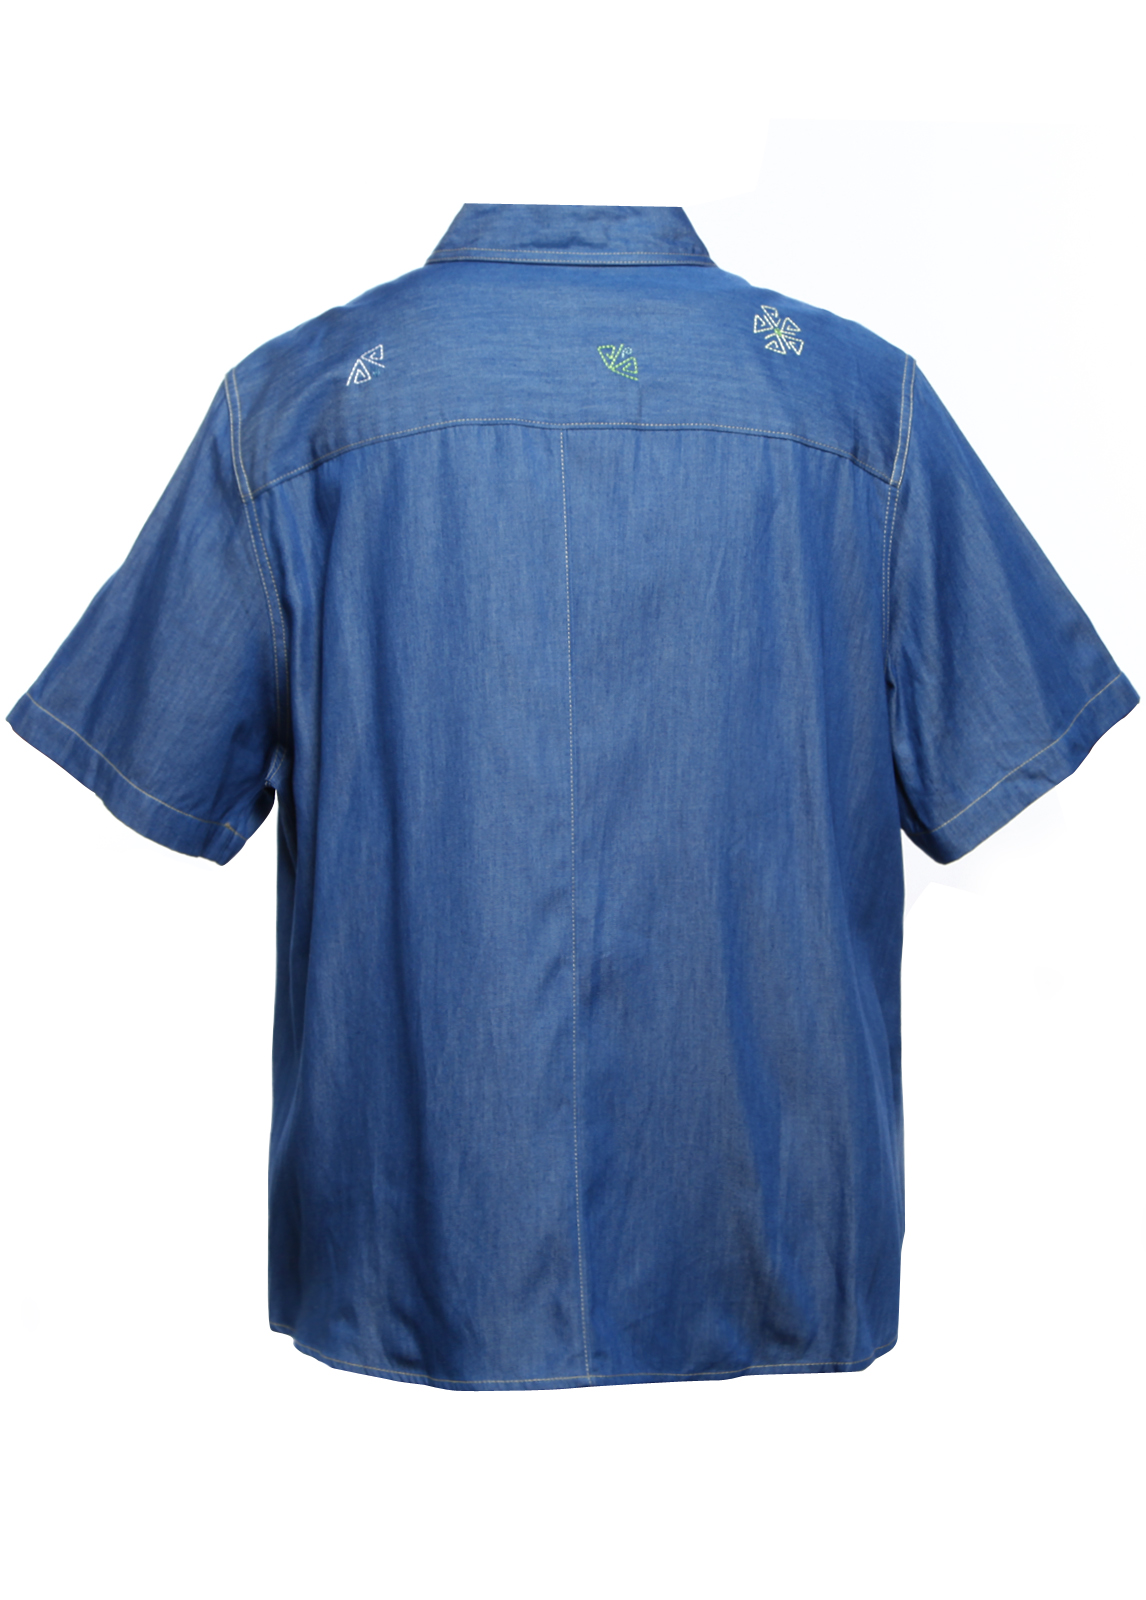 Koret Women Blouse Tops Short Sleeve Shirts Outfit Outwear